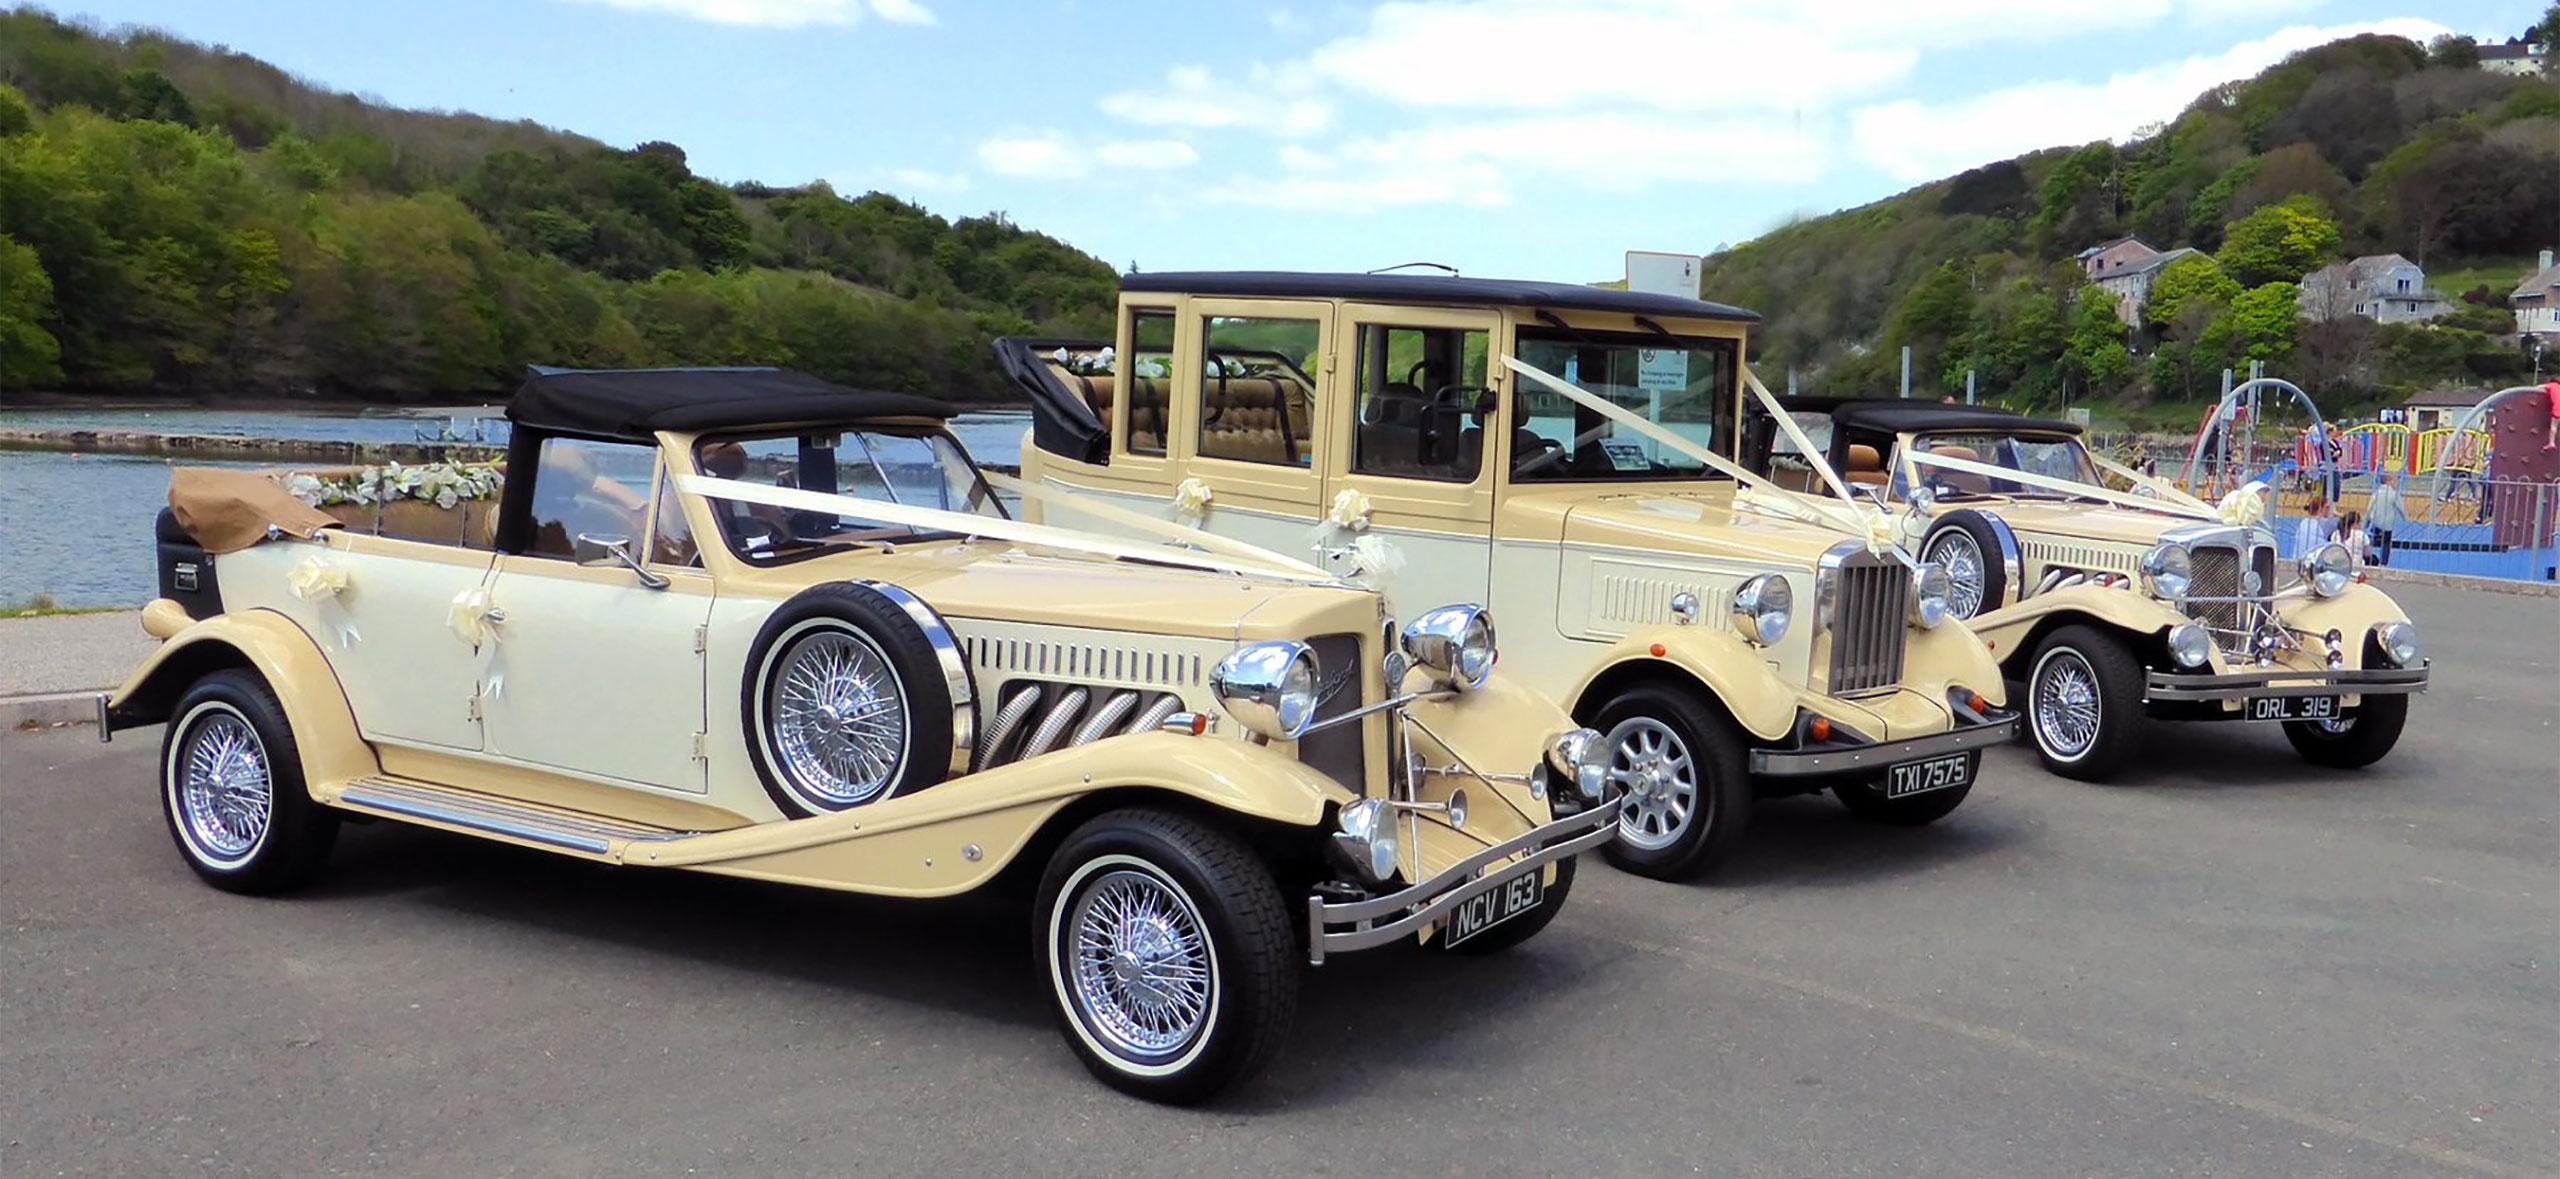 vintage wedding car hire cornwall